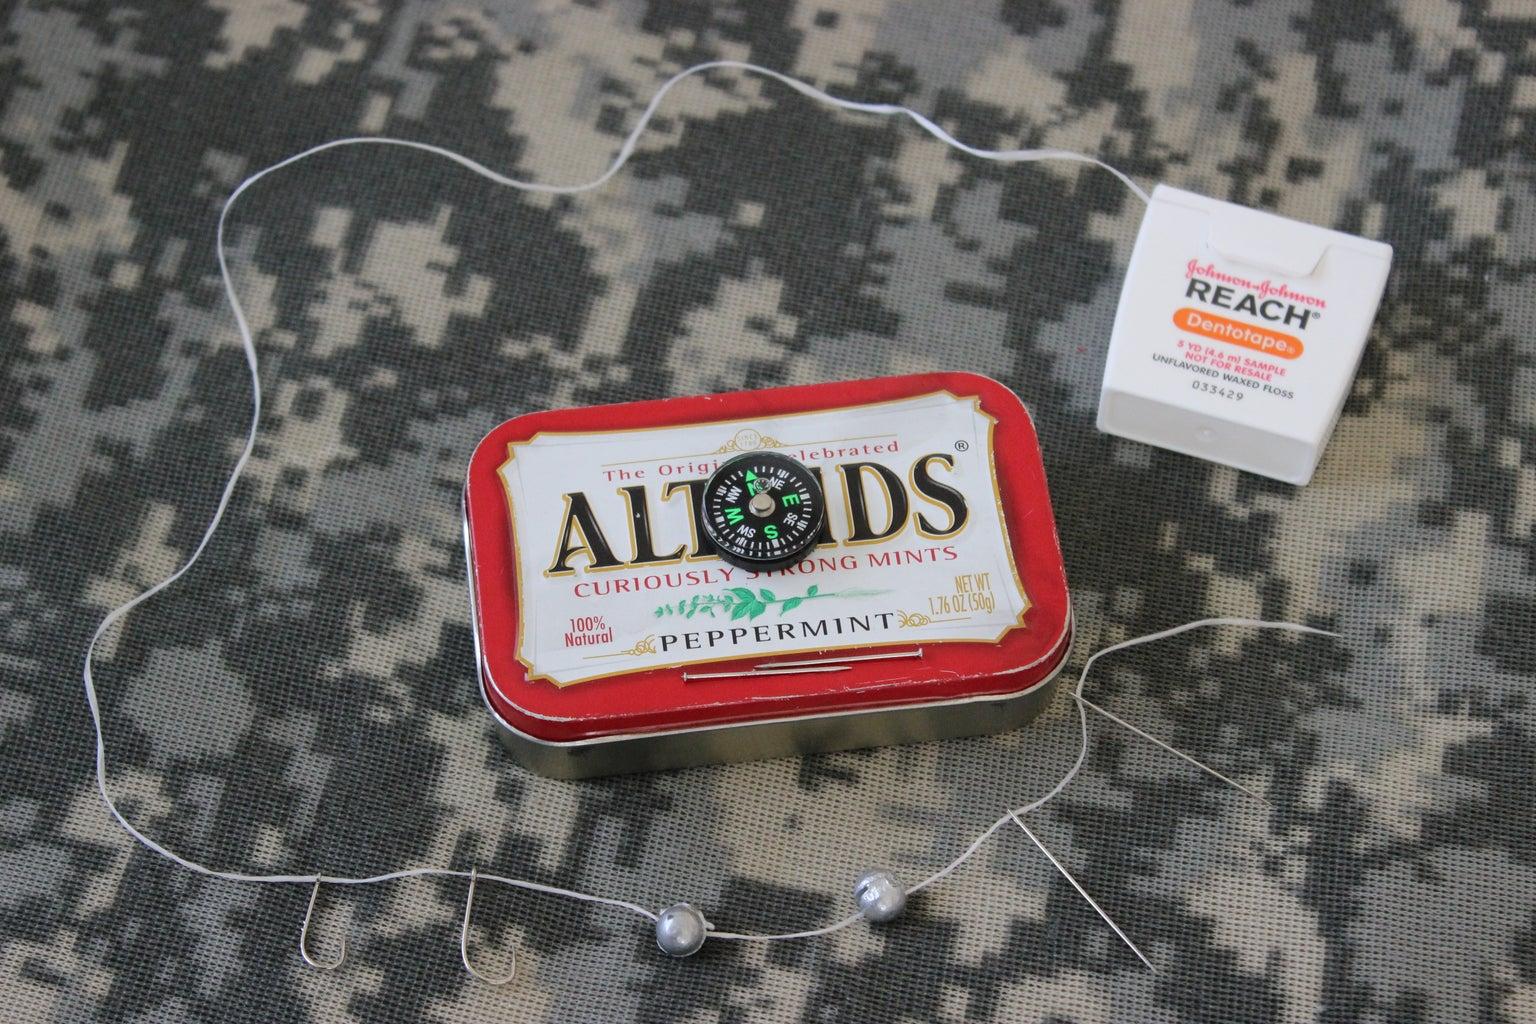 Compass, Pins & Needles